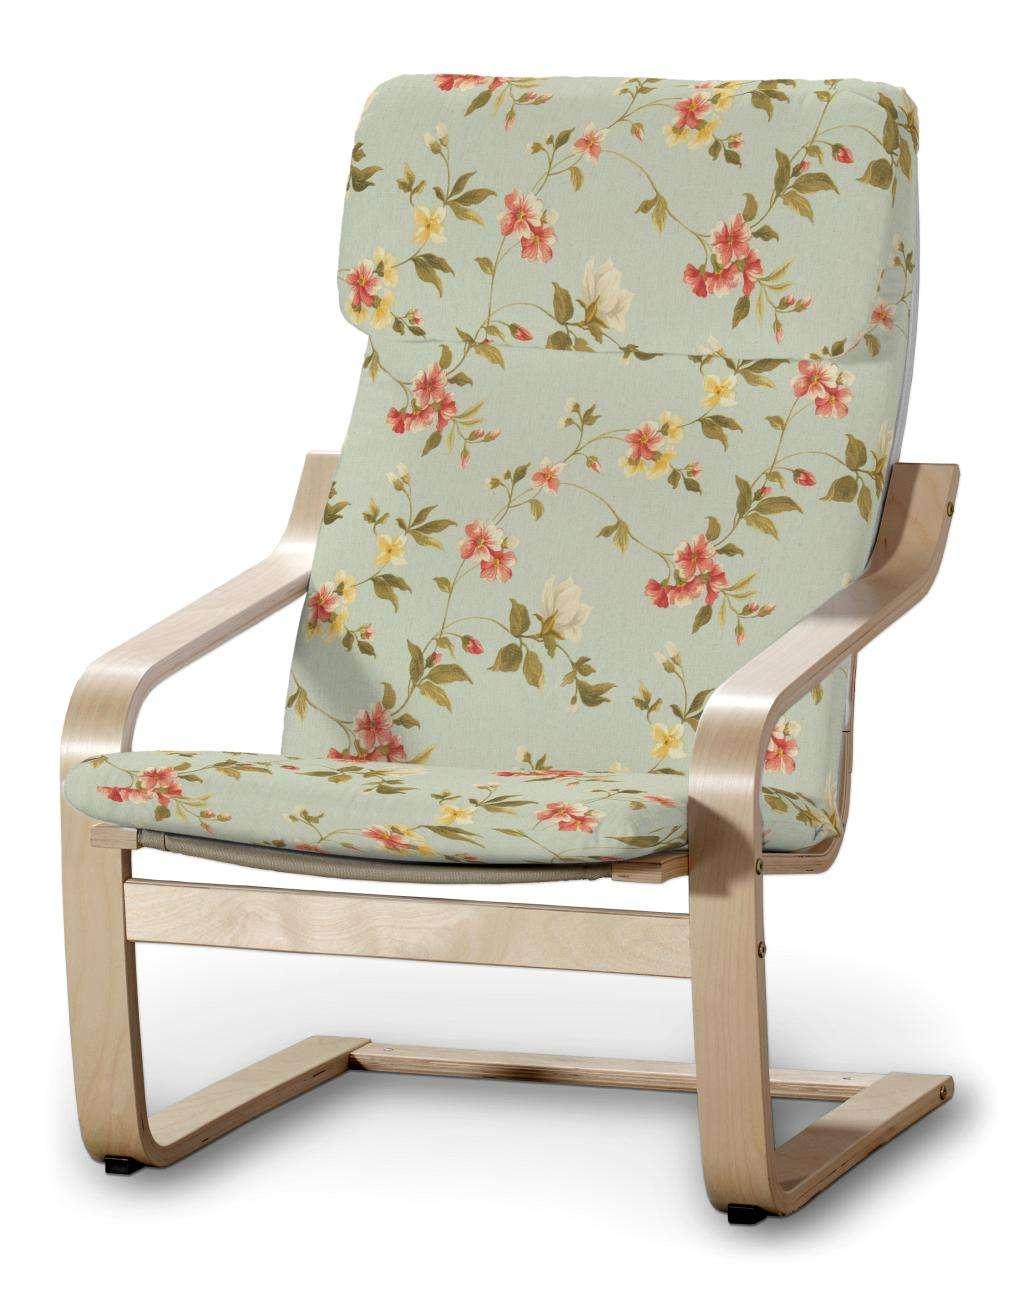 Poduszka na fotel Poäng w kolekcji Londres, tkanina: 124-65